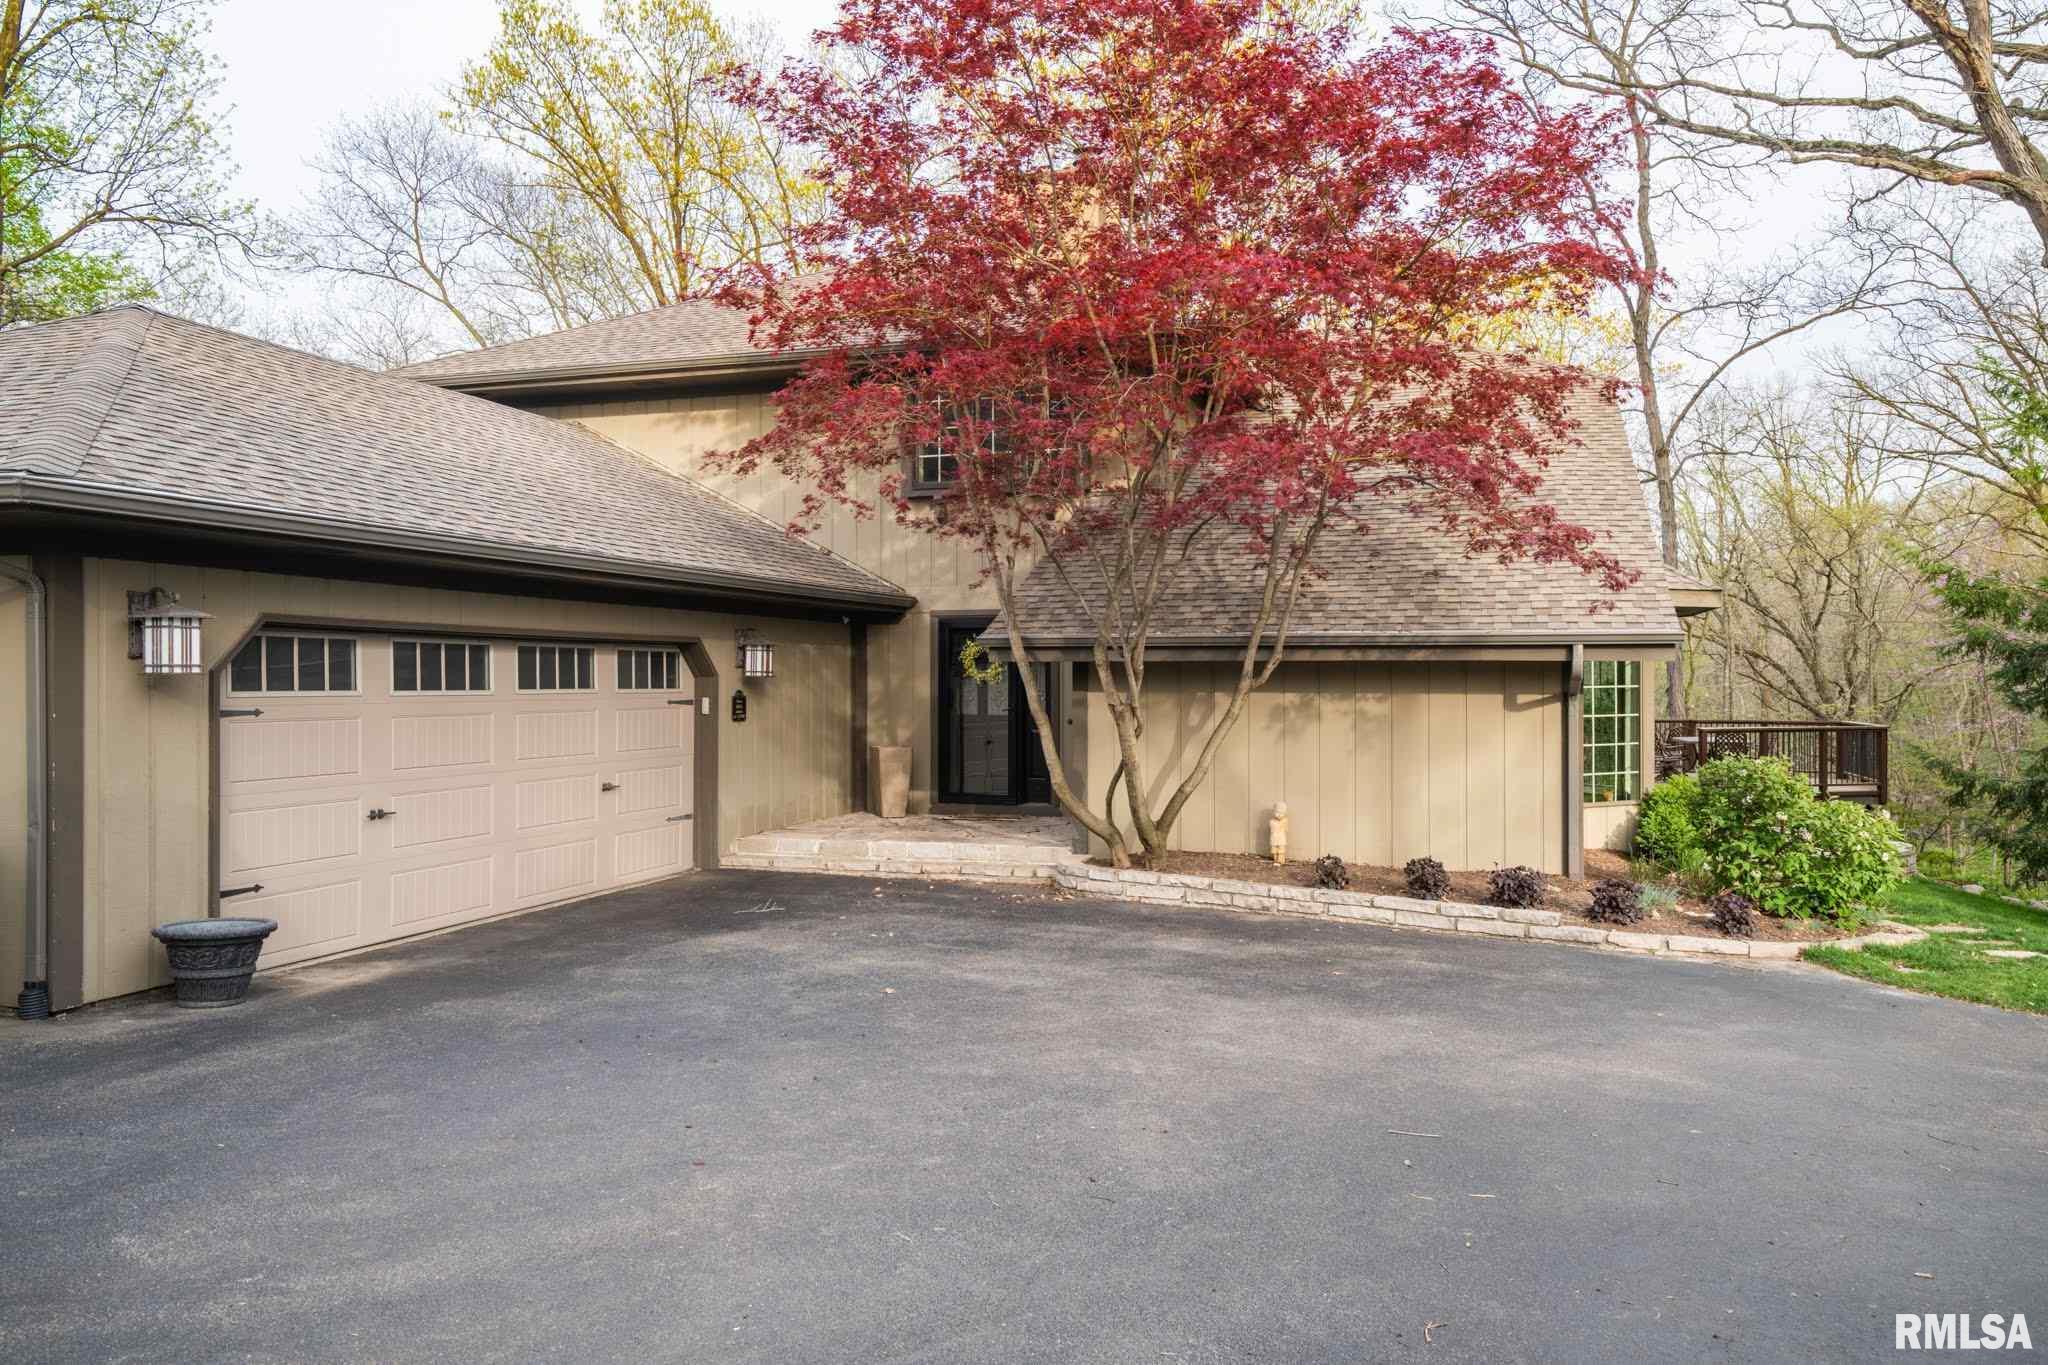 10207 W QUAIL HAVEN Property Photo - Edwards, IL real estate listing